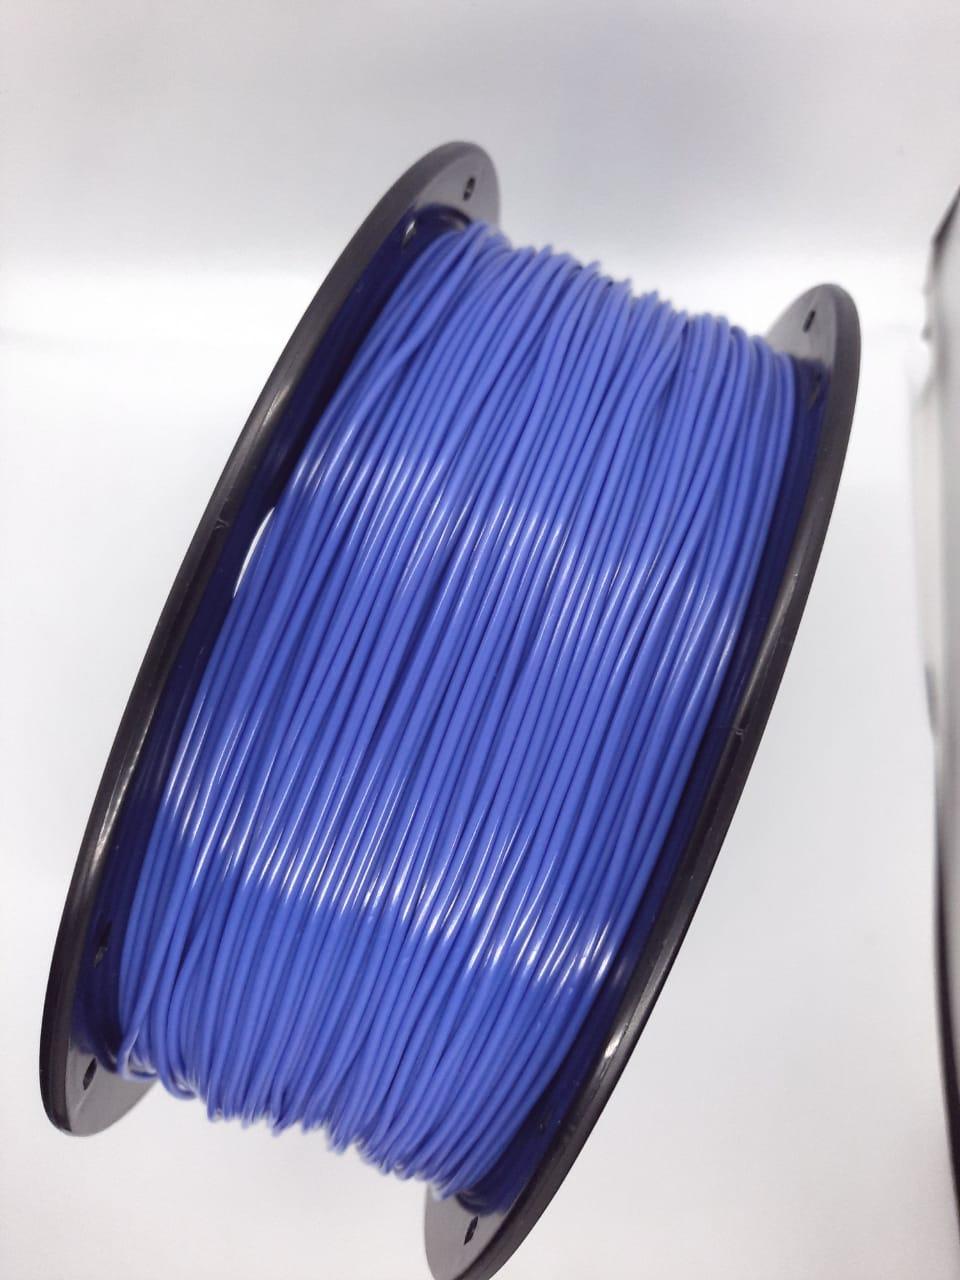 Filamento PLA - INGEO - Violeta - R3D - 1.75mm - 1kg